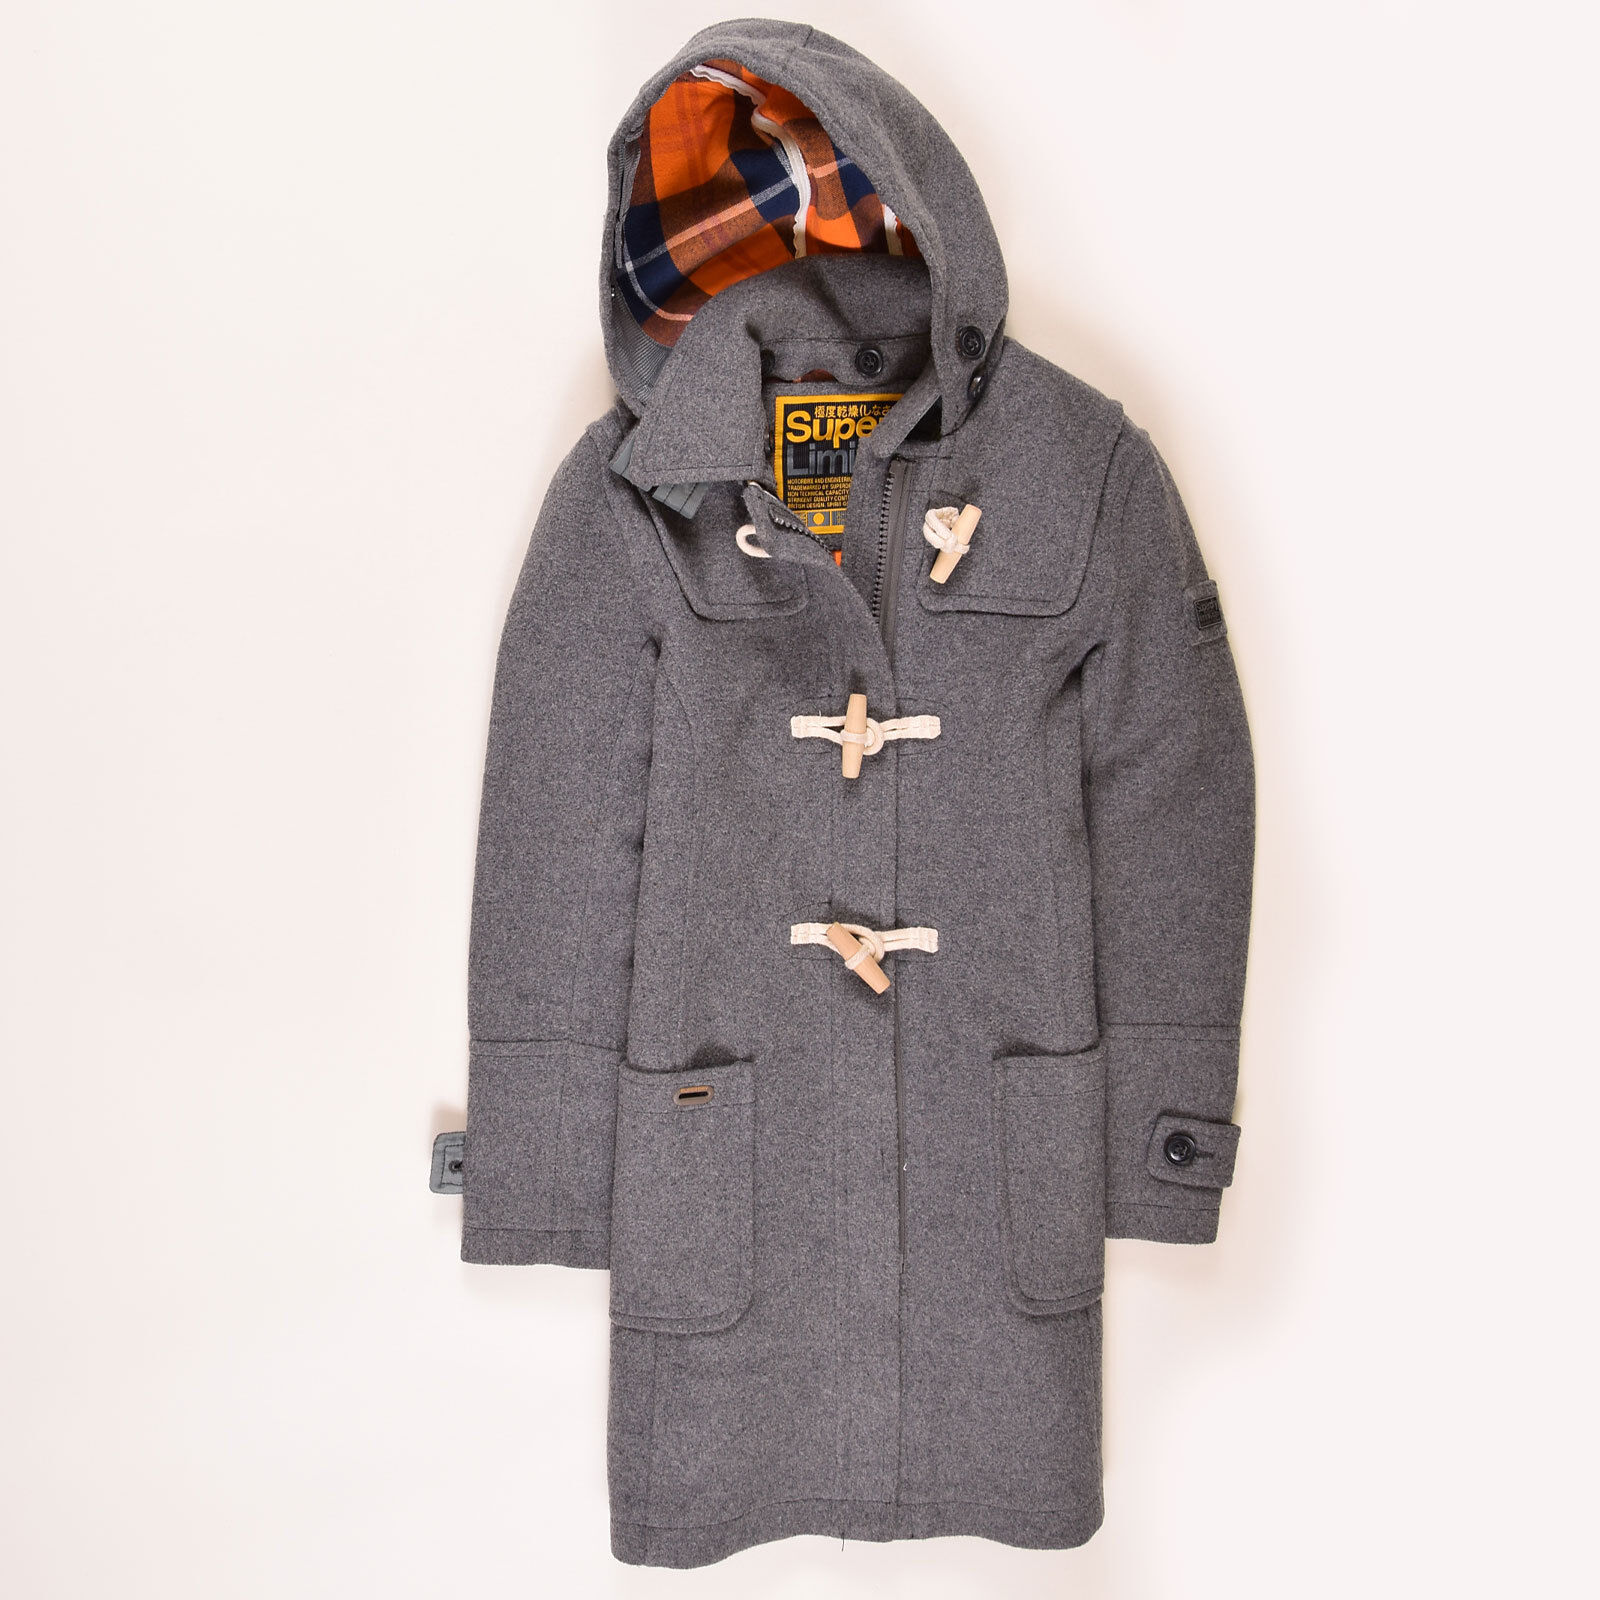 promo code 630b8 74687 Superdry Damen Jacke Coat Jacket Gr.M (DE 38) Limited Wolle ...